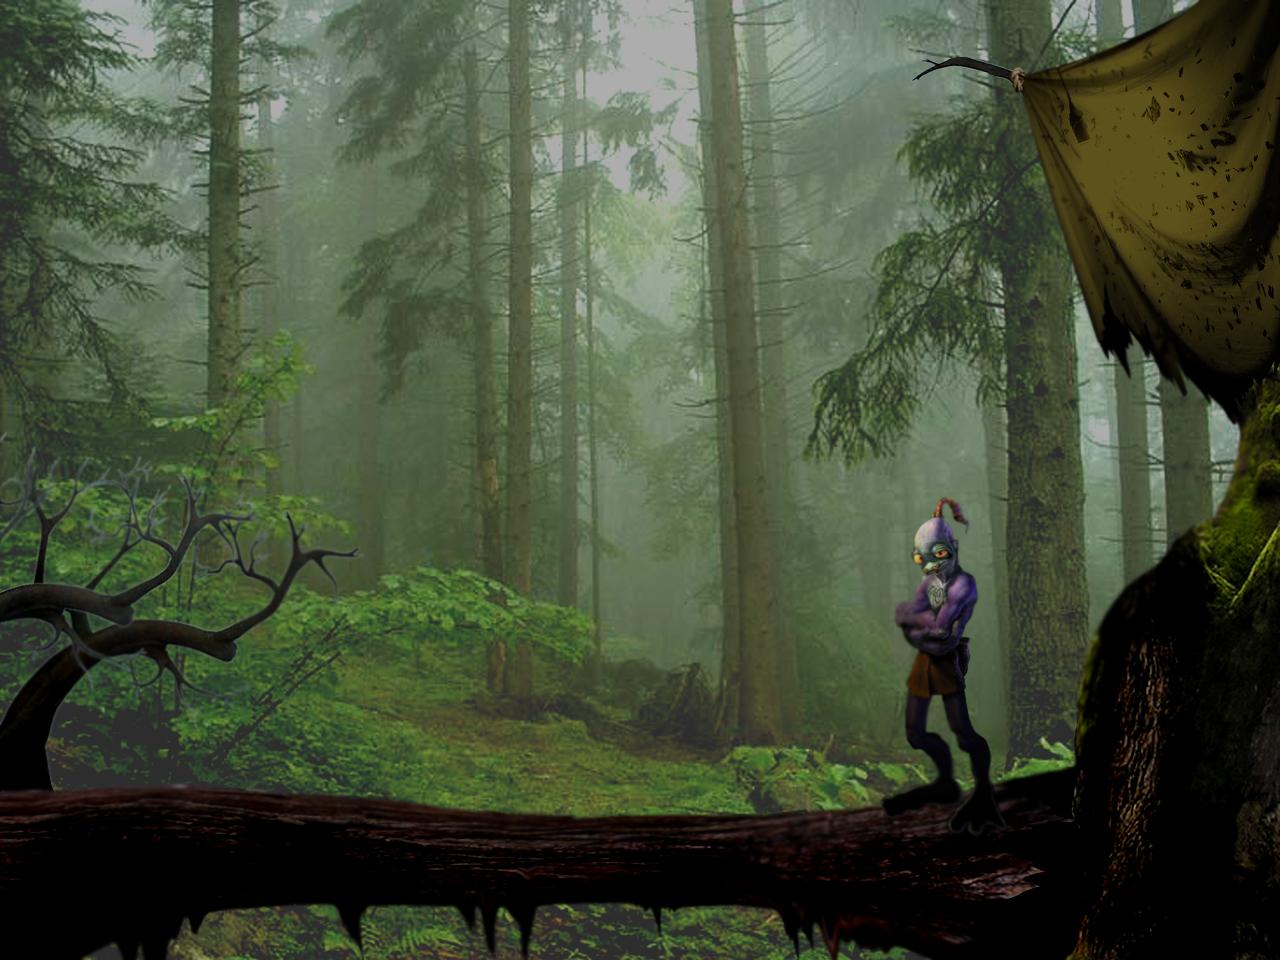 http://fc08.deviantart.net/fs71/f/2010/259/1/2/abe_hd_bg_1_by_theoddworldland-d2yun62.jpg